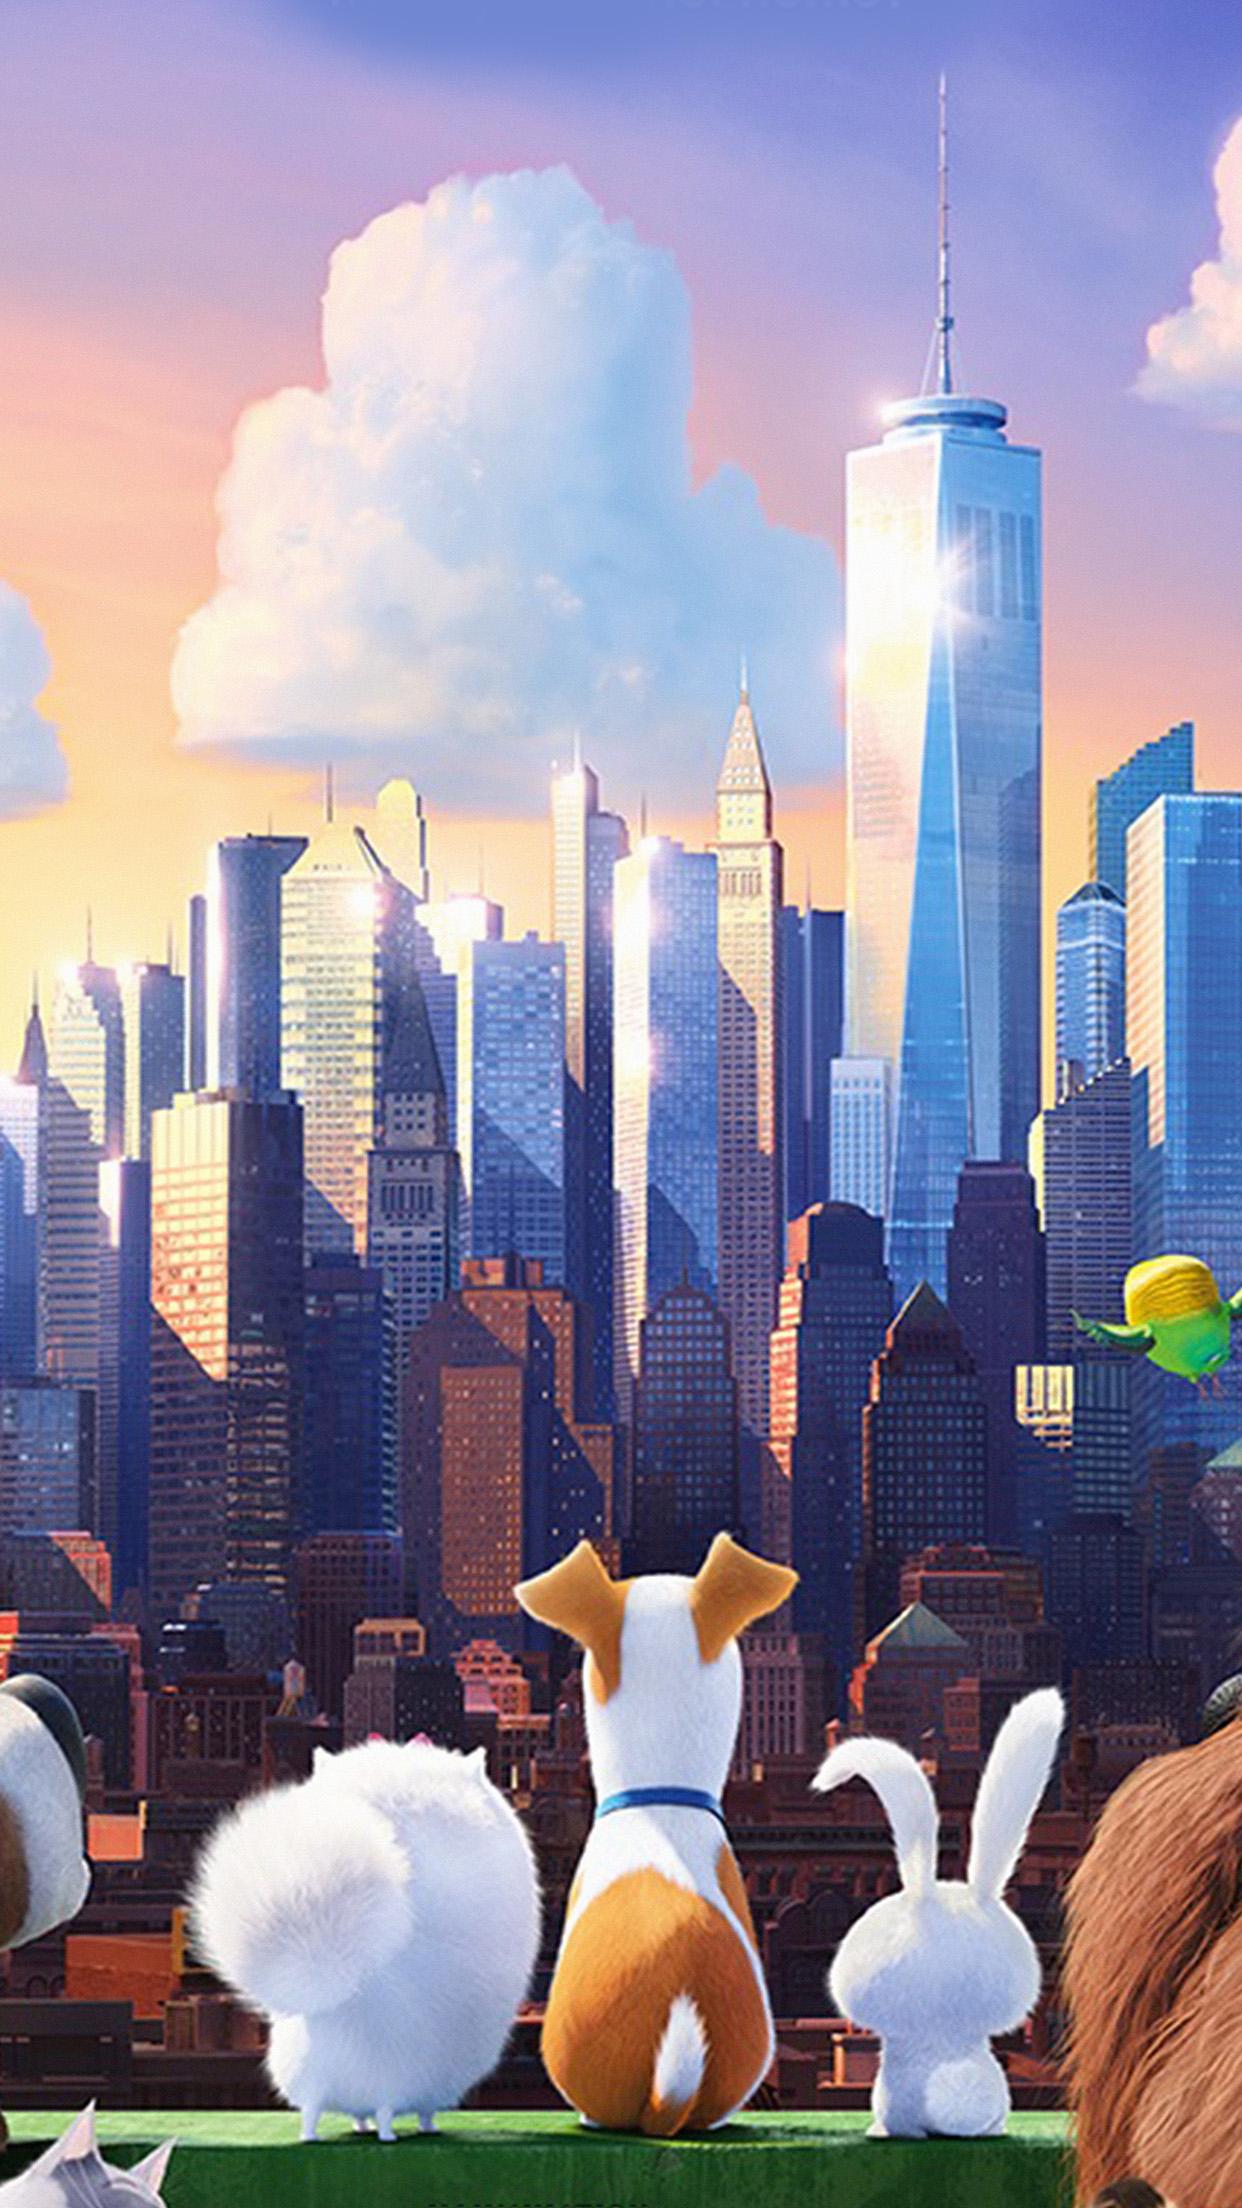 as60-secret-life-of-pets-animation-art-illustration-wallpaper